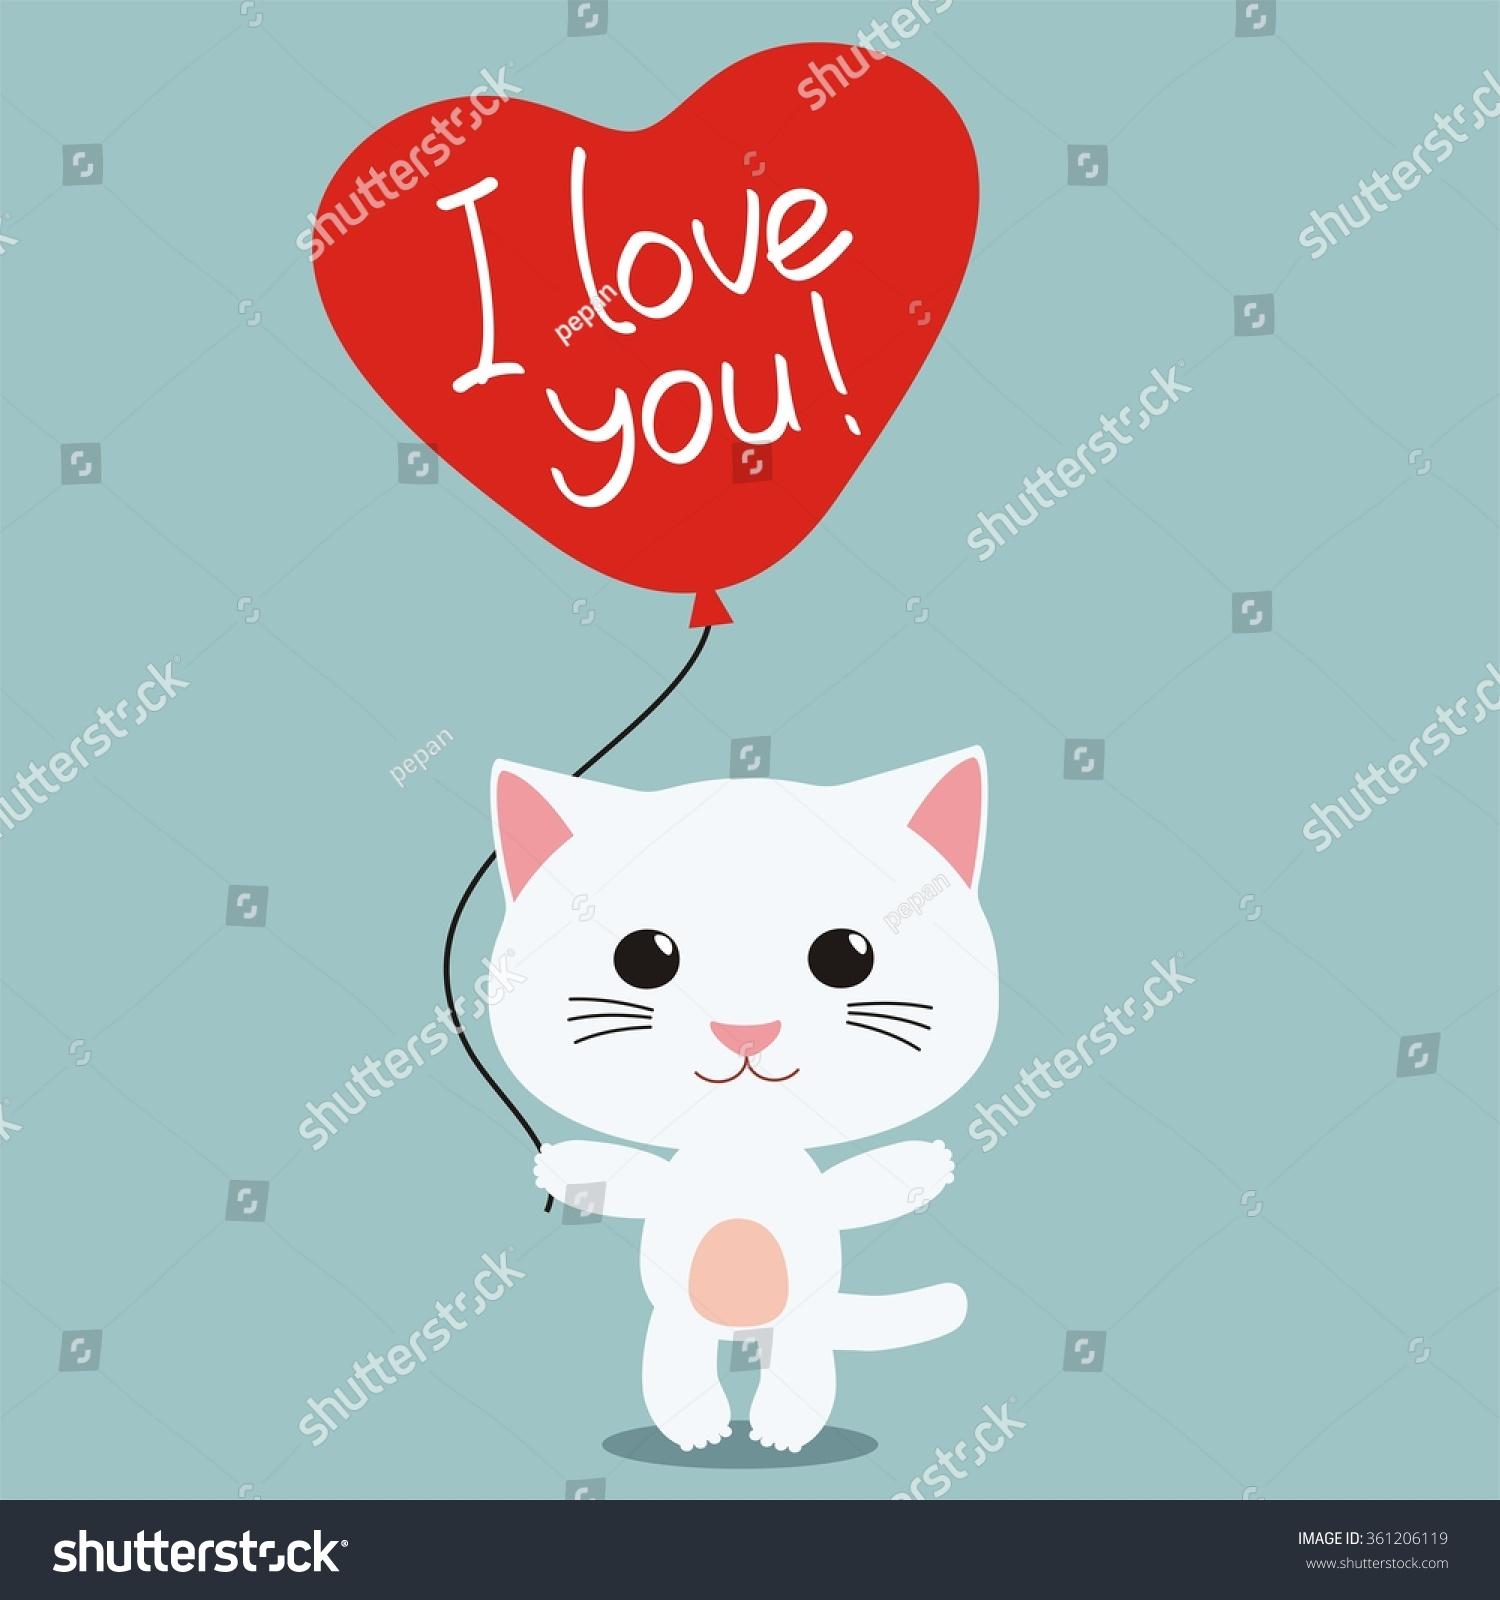 Love You Cute Kitten Heart Balloon Stock Vector Royalty Free